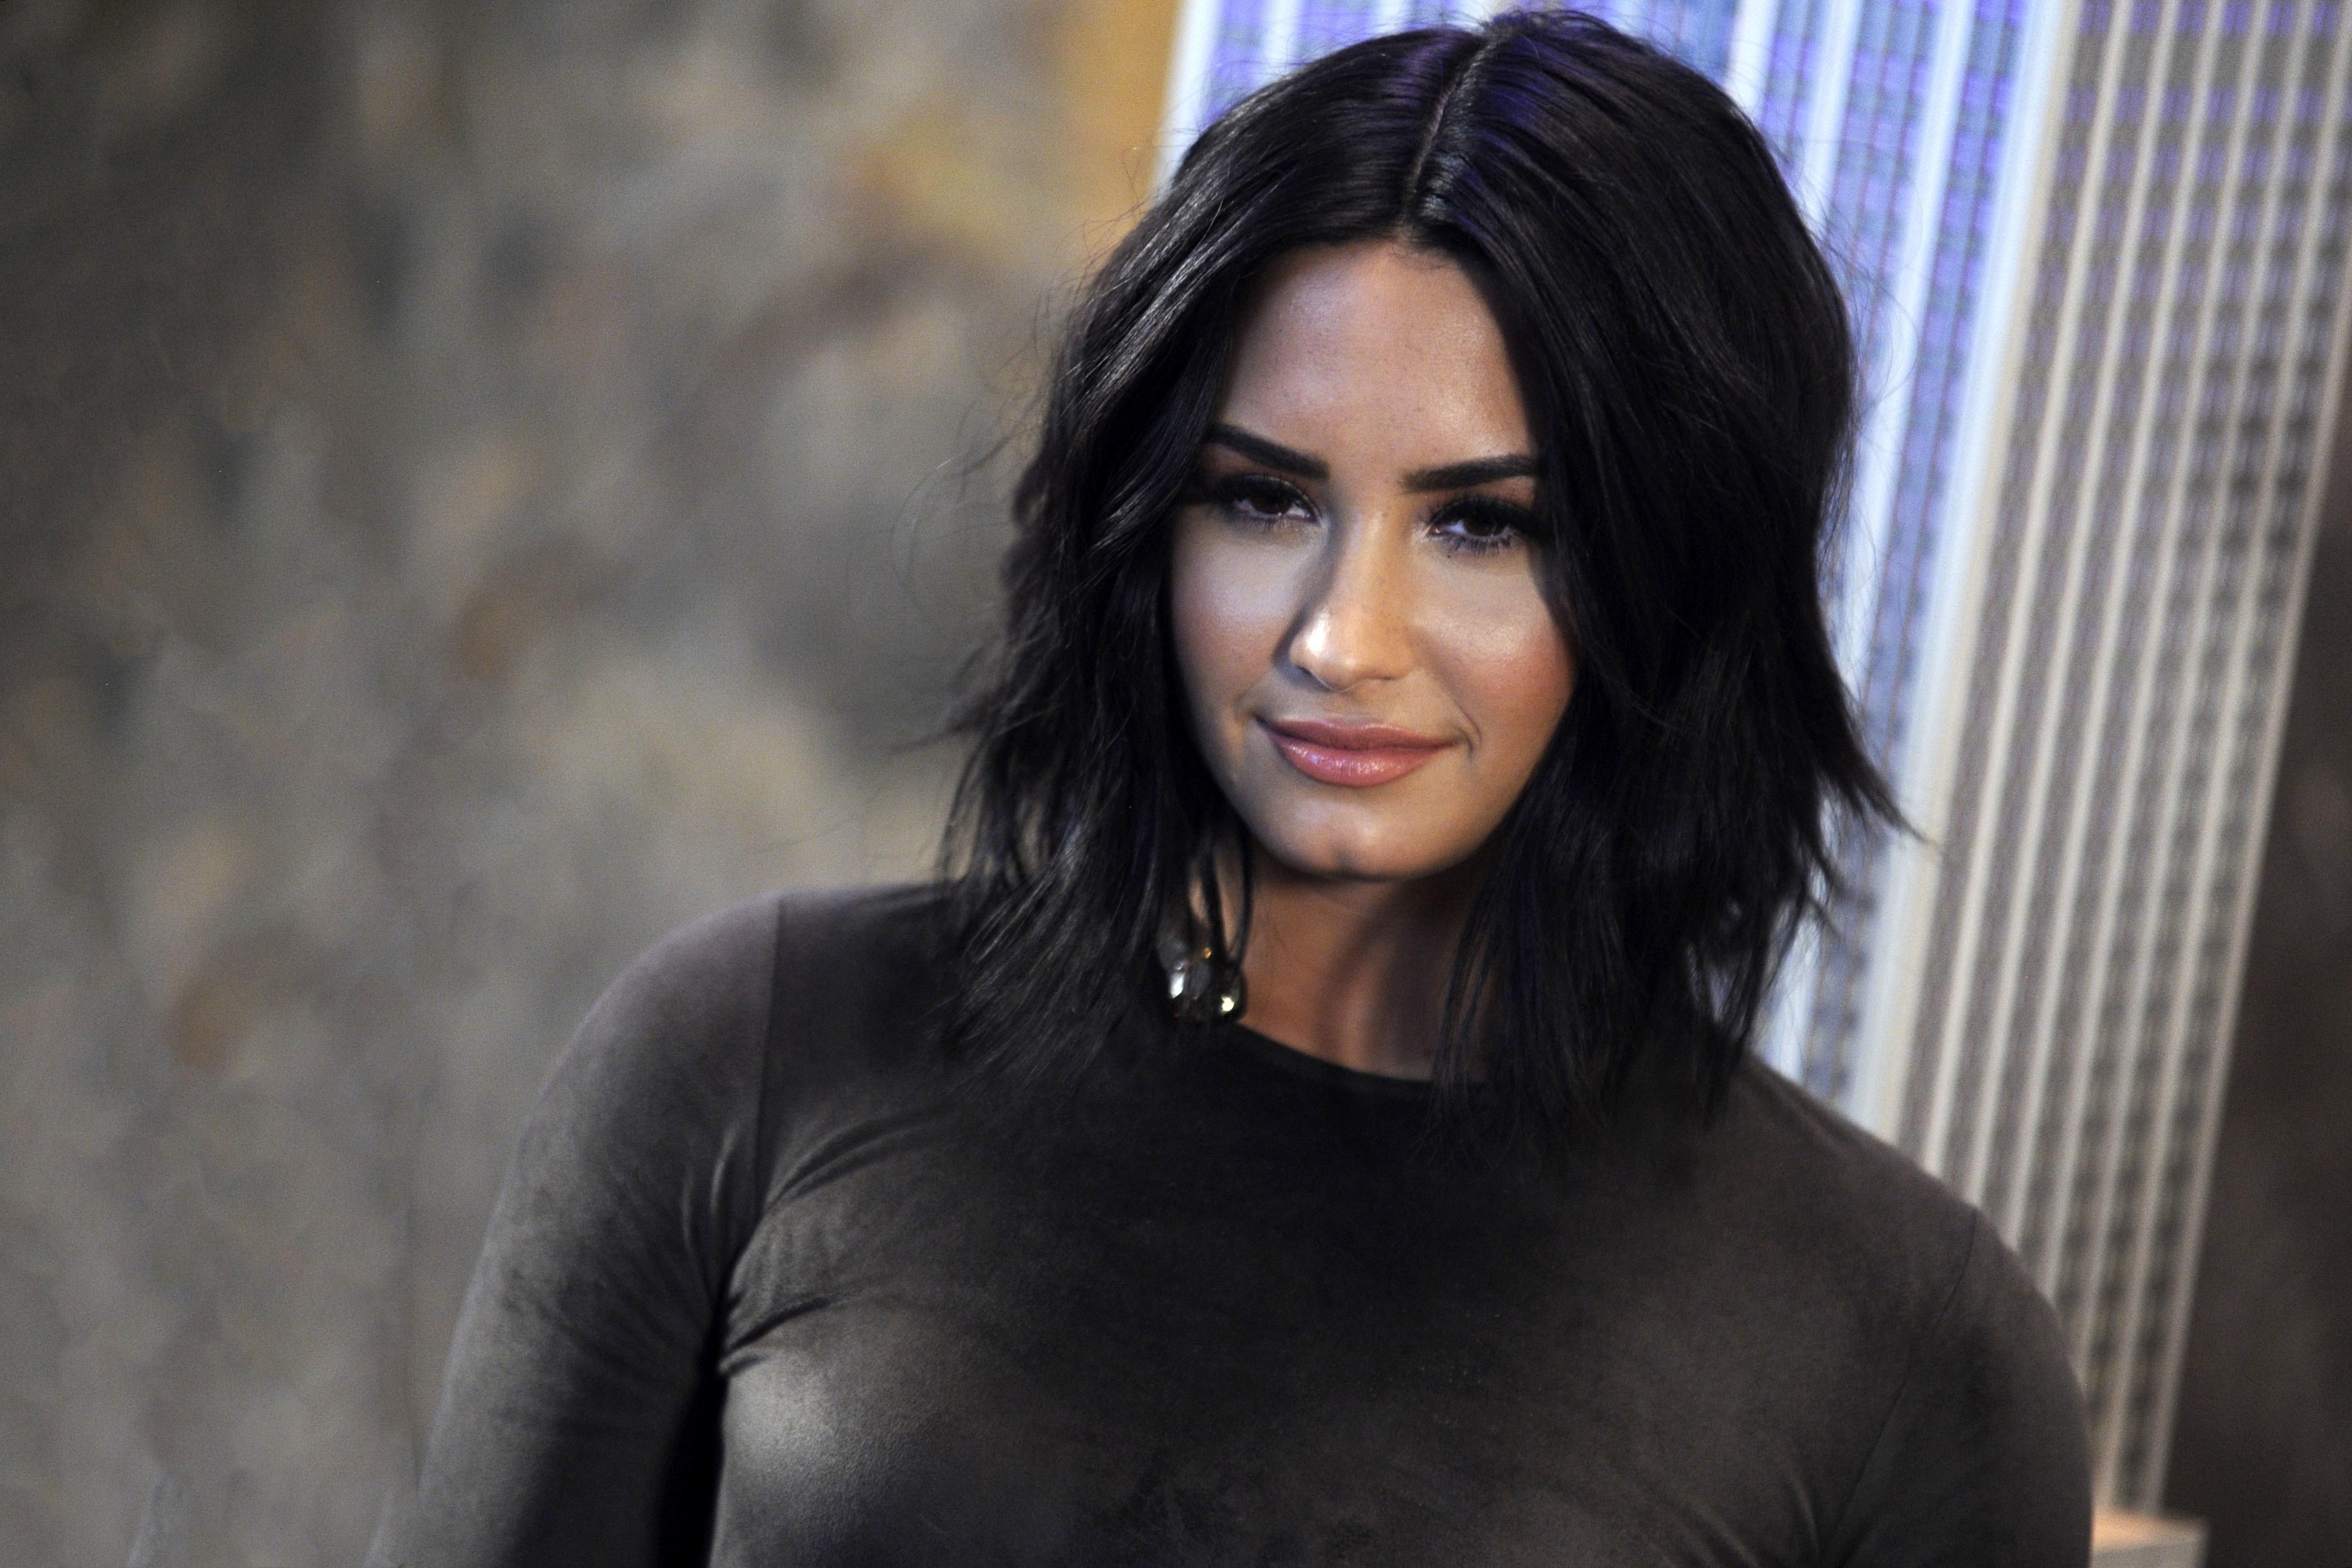 Demi Lovato 4k Hd Celebrities 4k Wallpapers Images